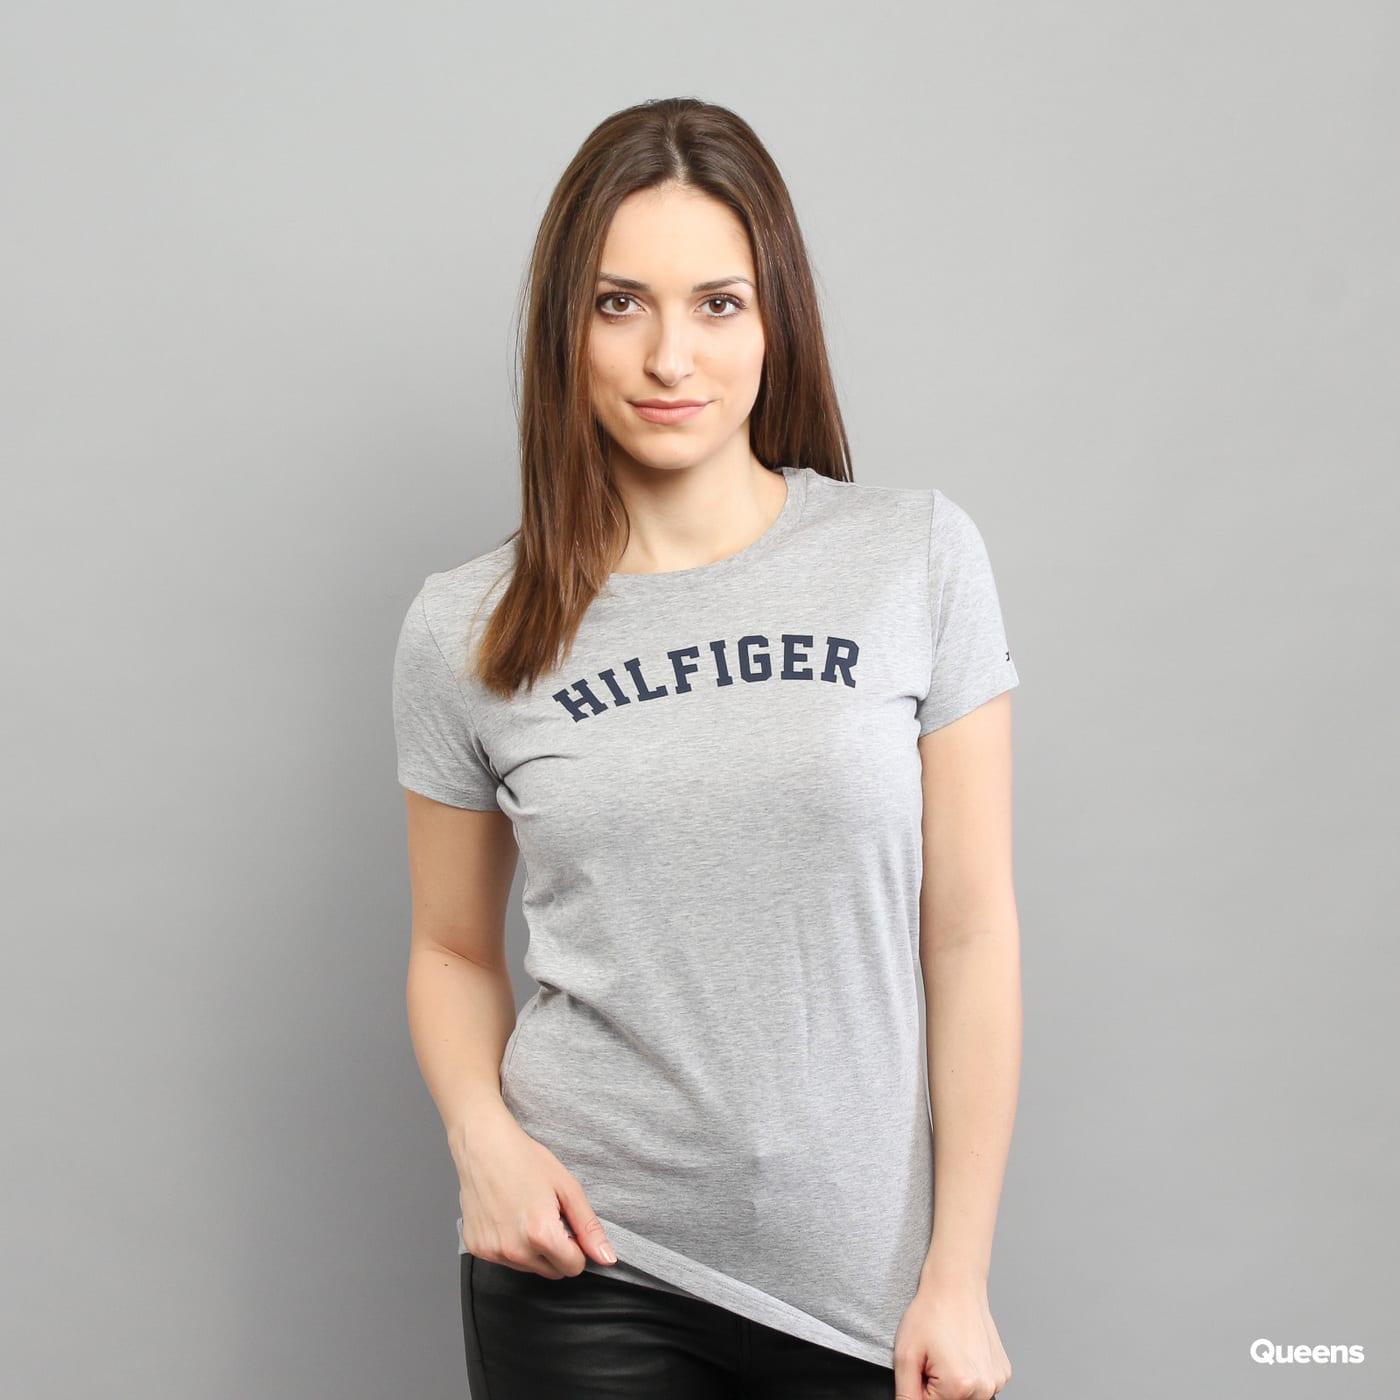 Dámské tričko Tommy Hilfiger SS Tee Print C O (UW0UW00091 004) – Queens 💚 1945c830abf